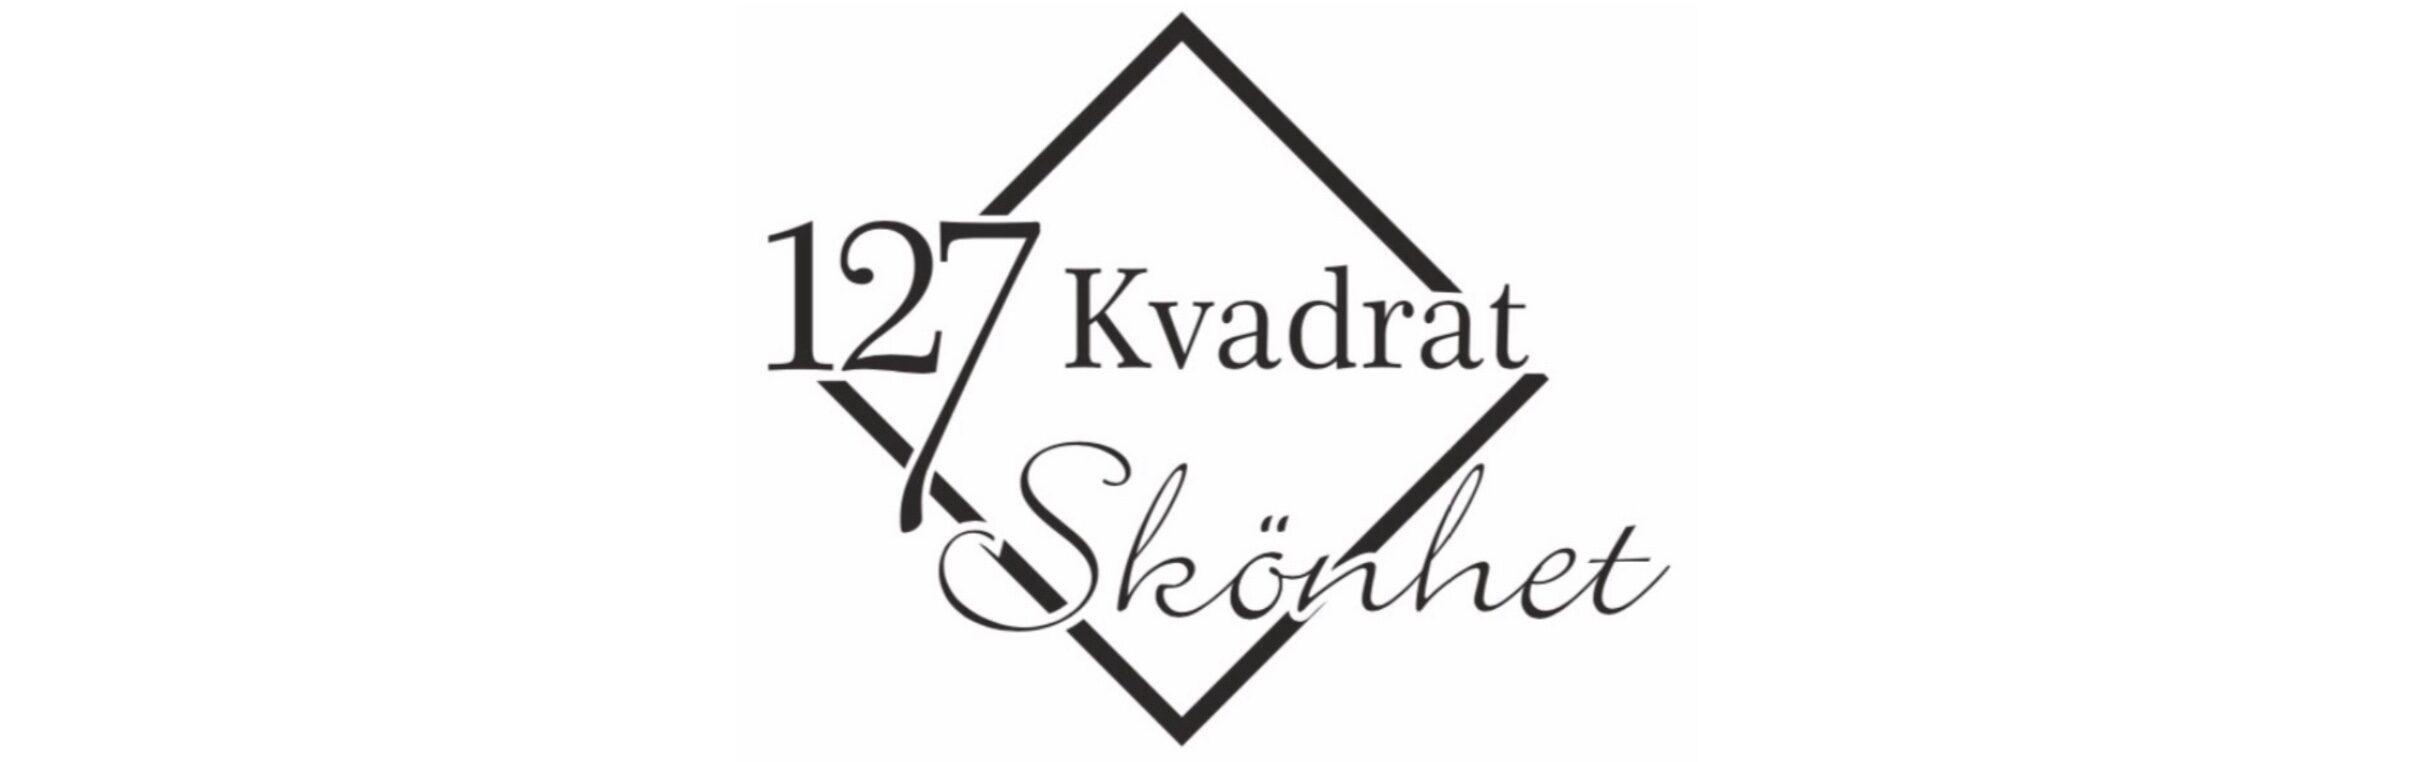 127 Kvadrat Skönhet